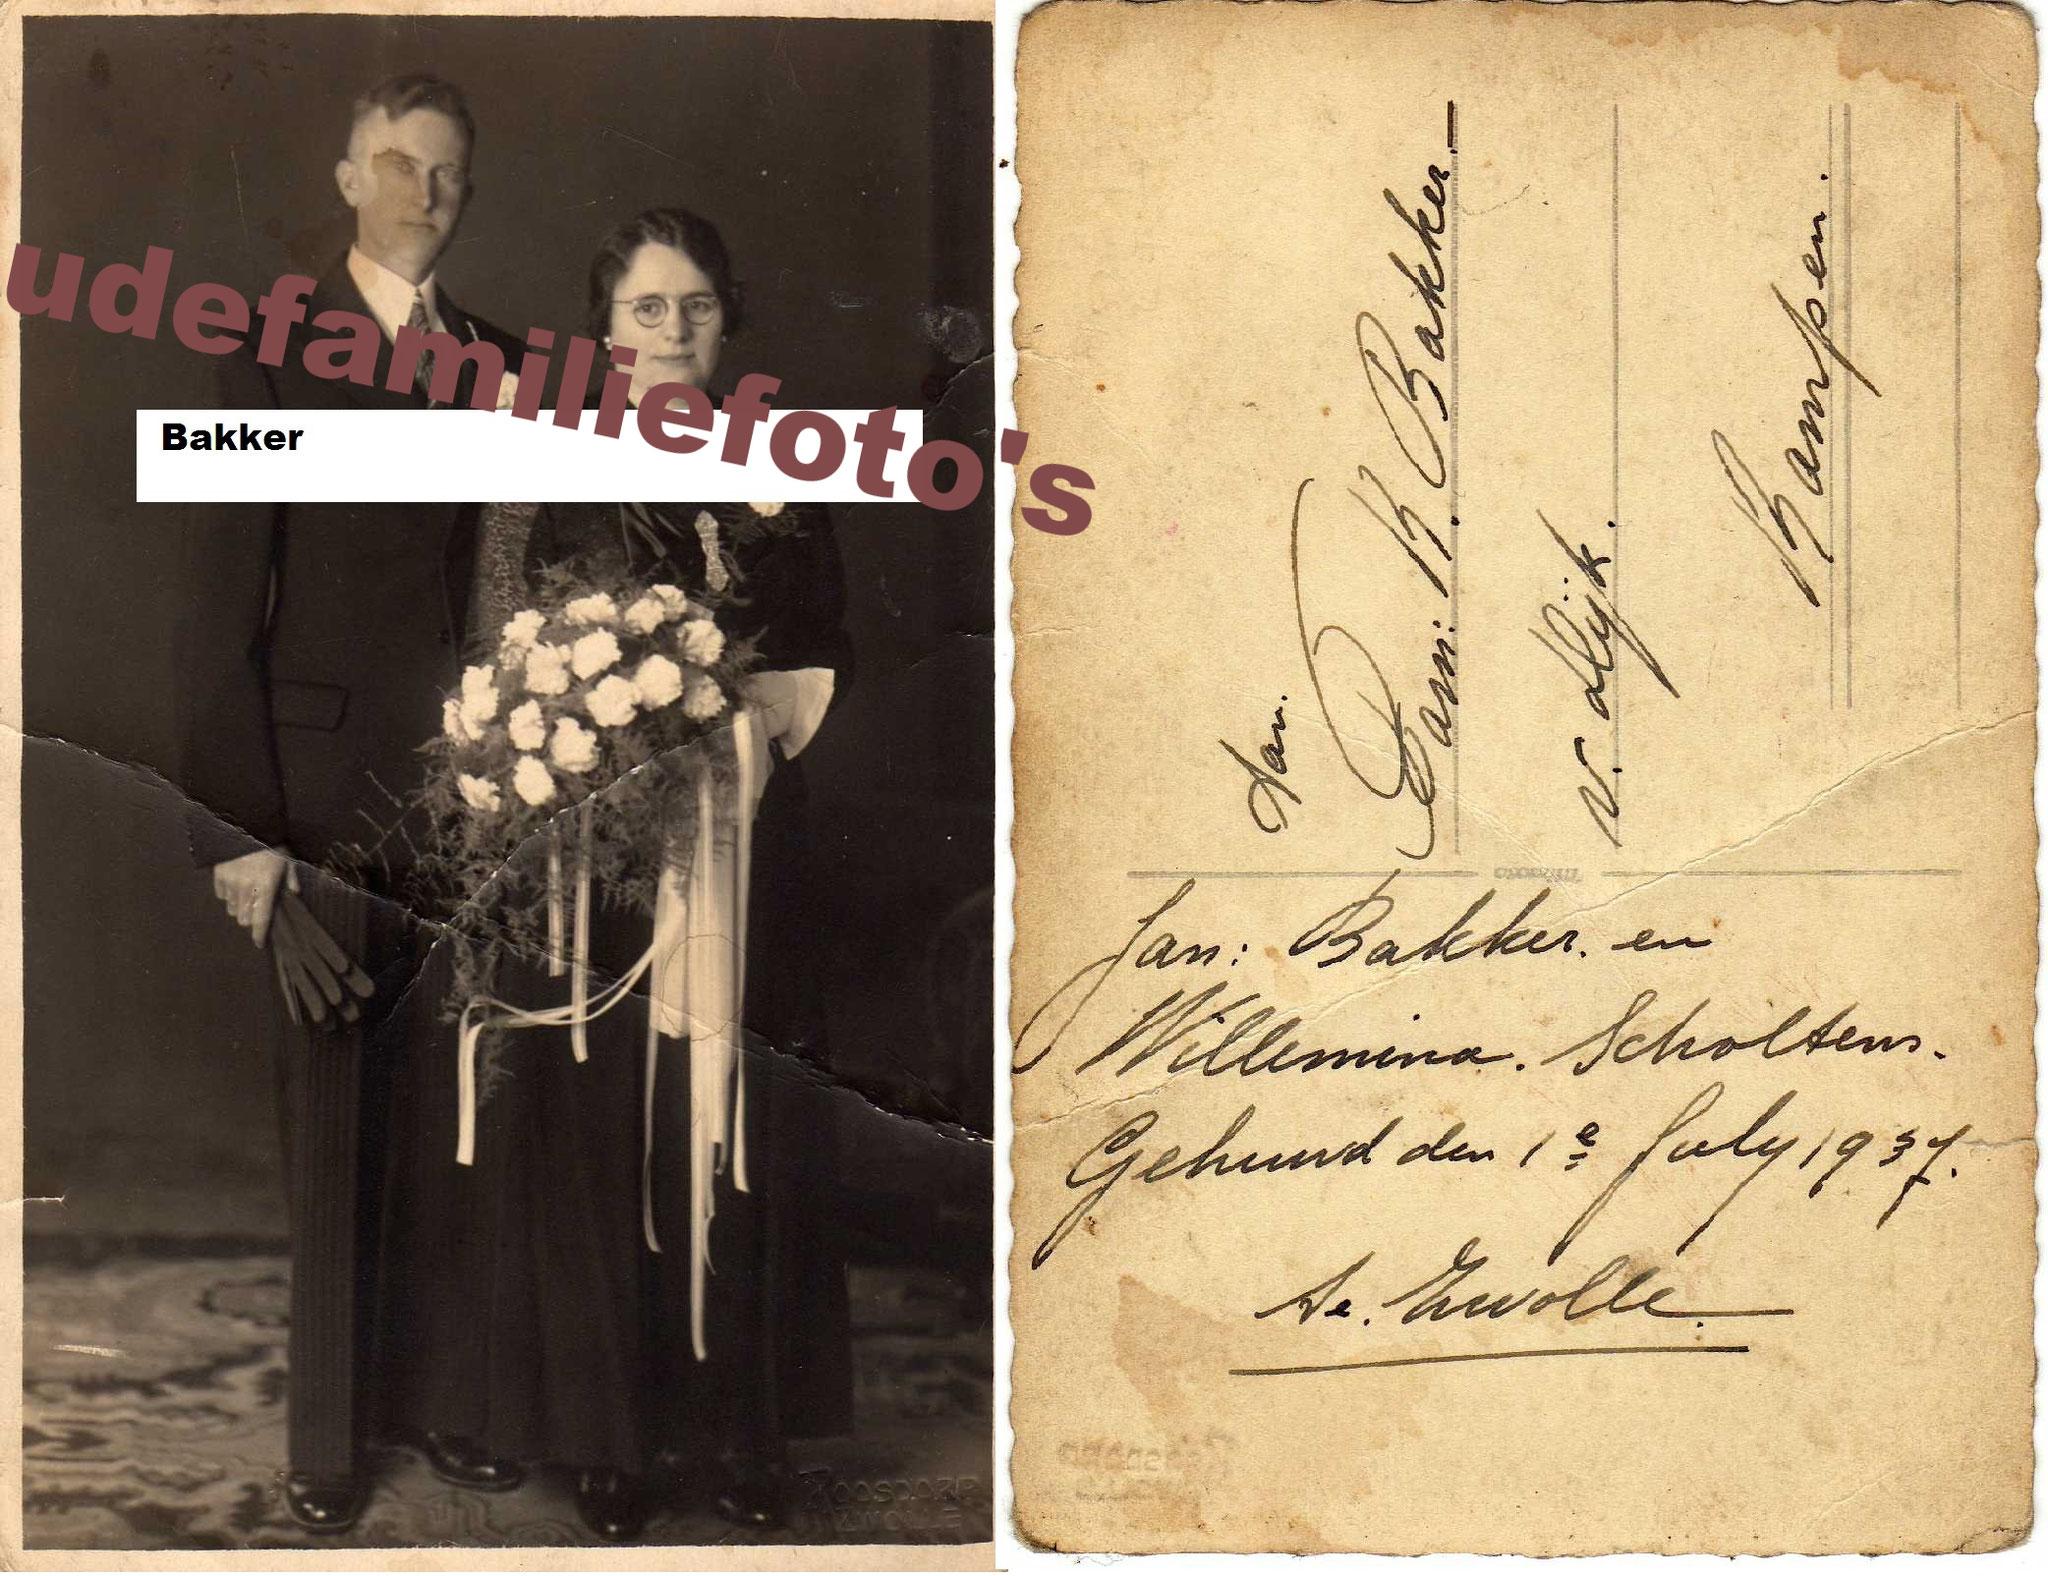 Bakker, Jan Scholtens Wilhelmina getrouwd 1-7-1937 Zwolle € 2,00